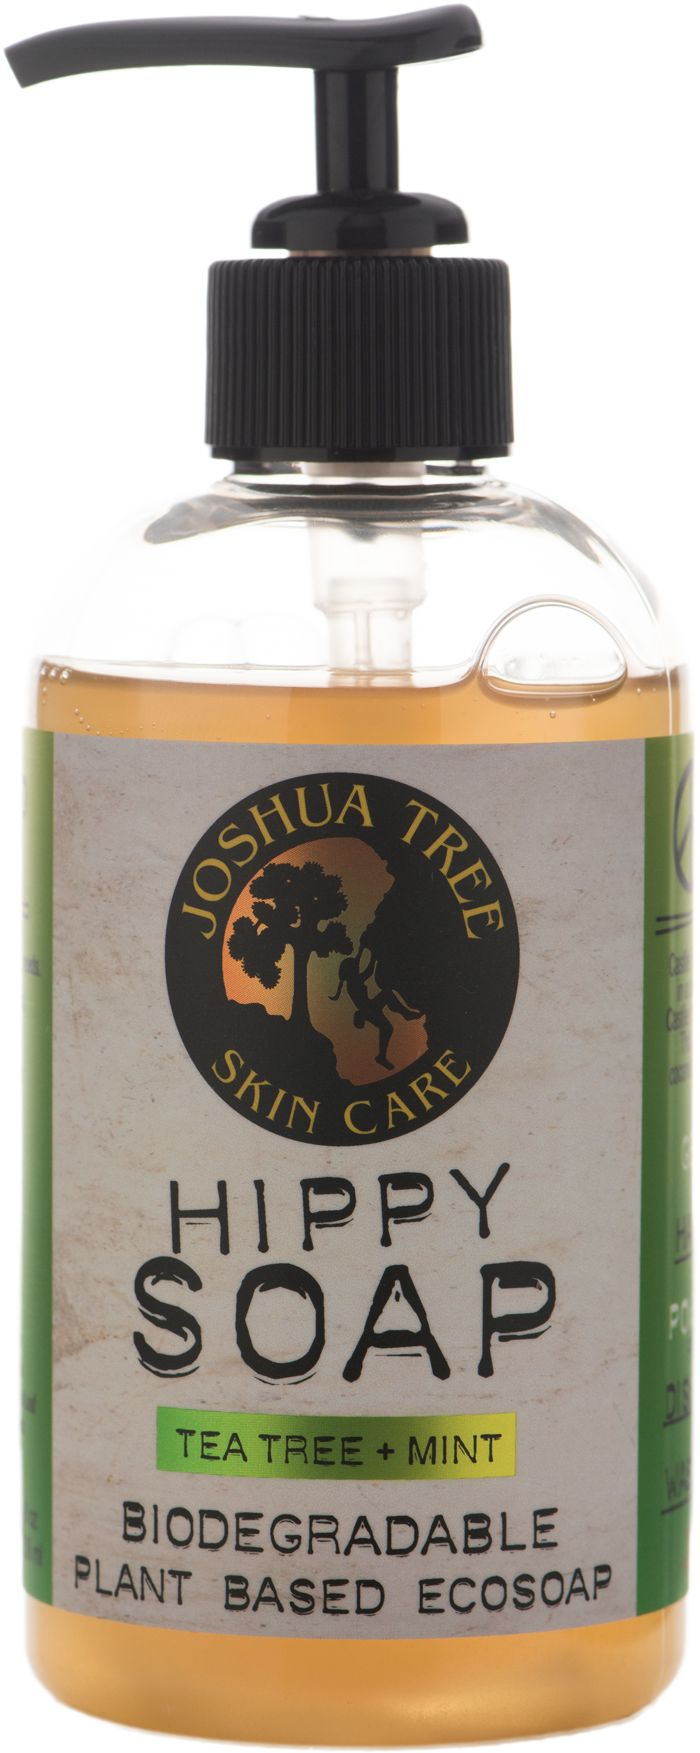 Joshua Tree Hippy Soap - Biodegradable Plant Based Ecosoap - Tea Tree + Mint